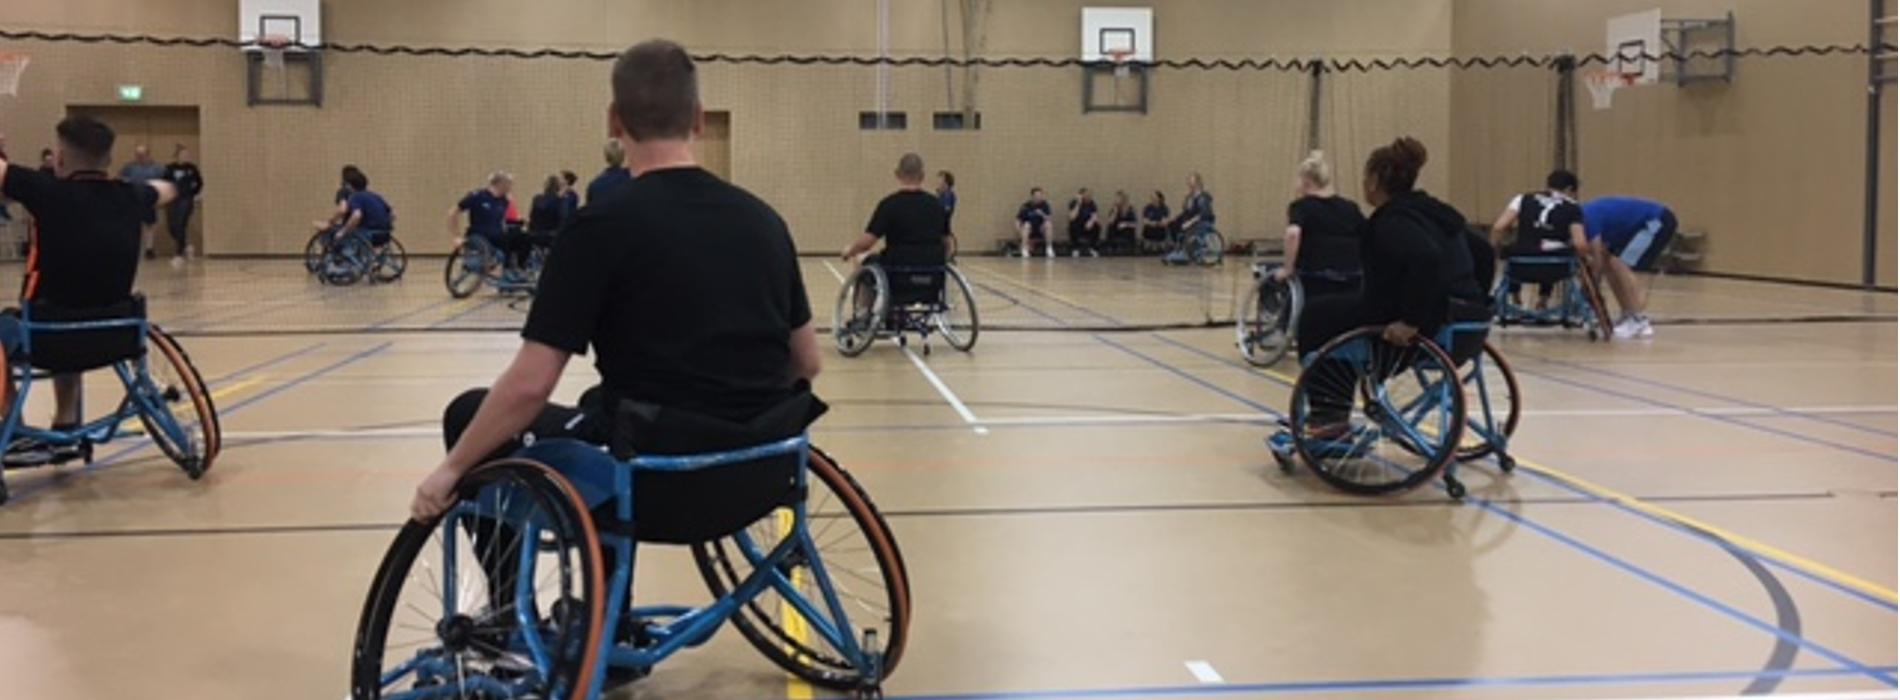 Vakmensen-team rolstoelbasketbaltoernooi